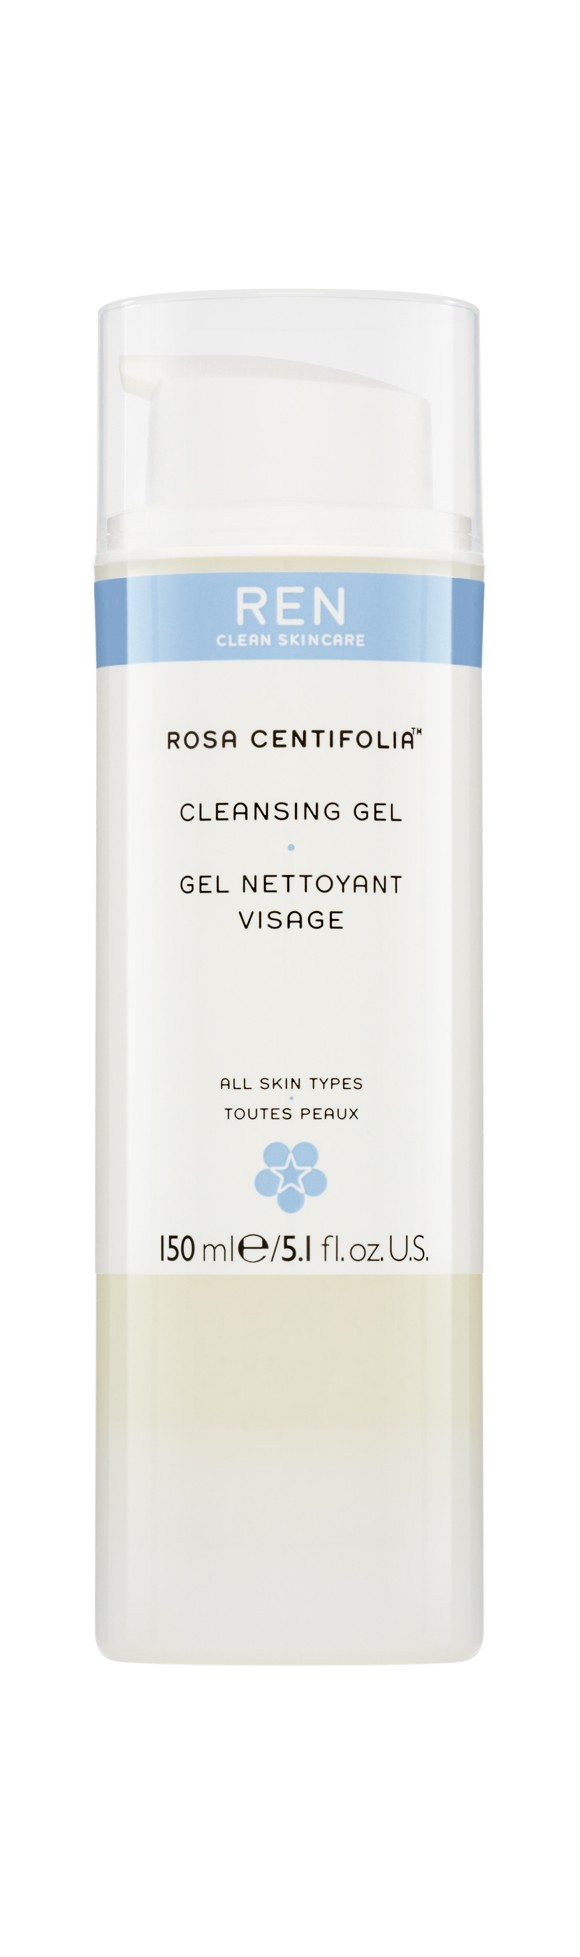 REN - Rosa Centifolia Cleansing Gel 150 ml